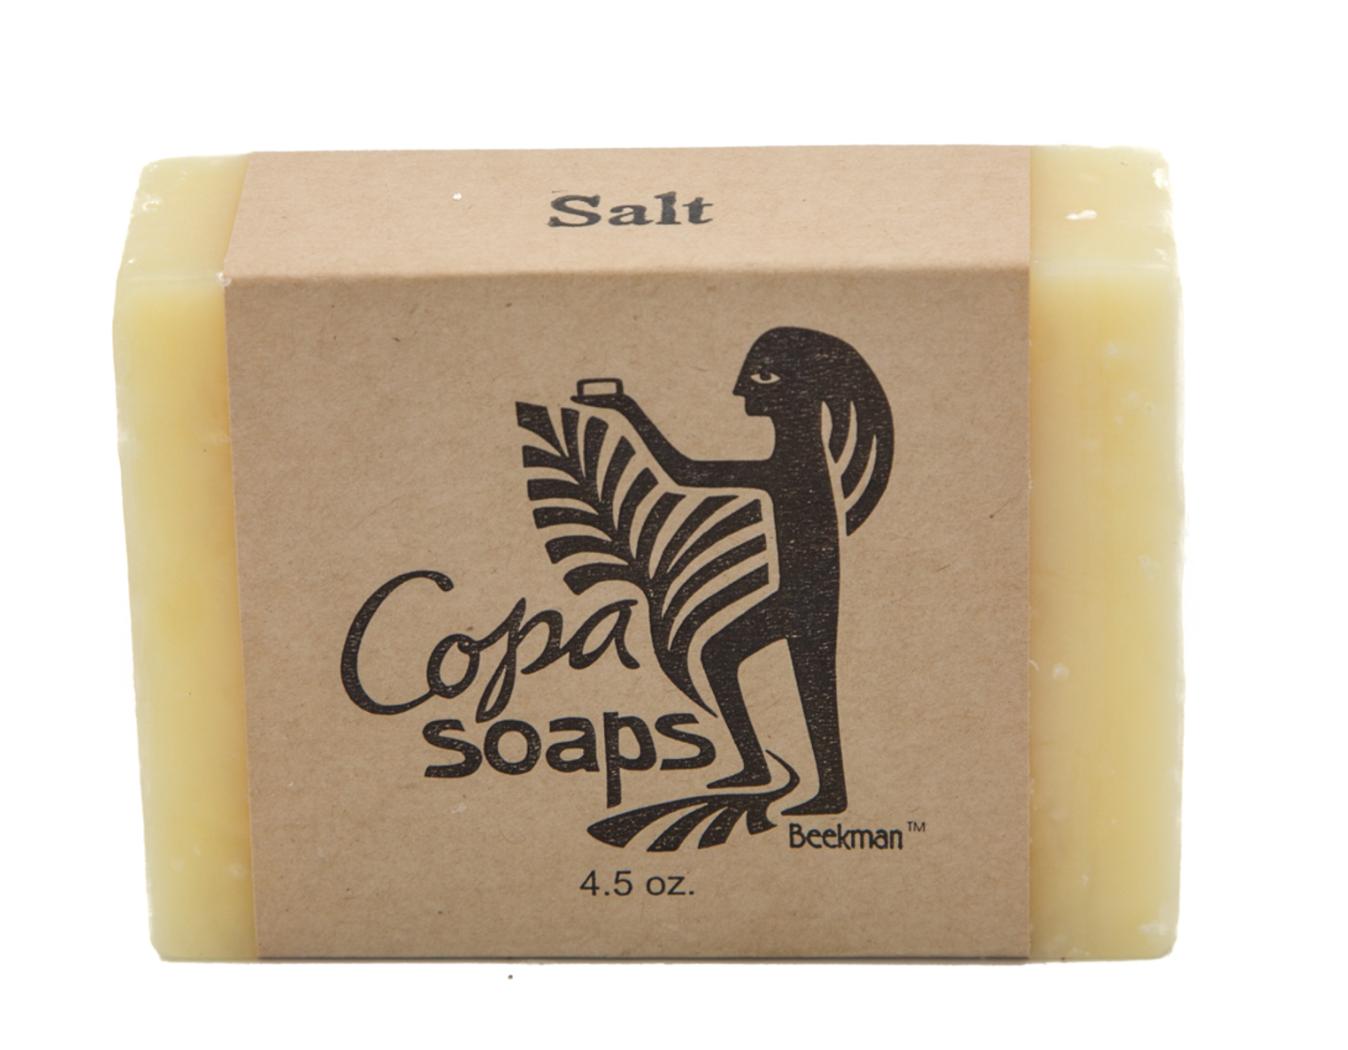 COPA Soaps Salt Soap